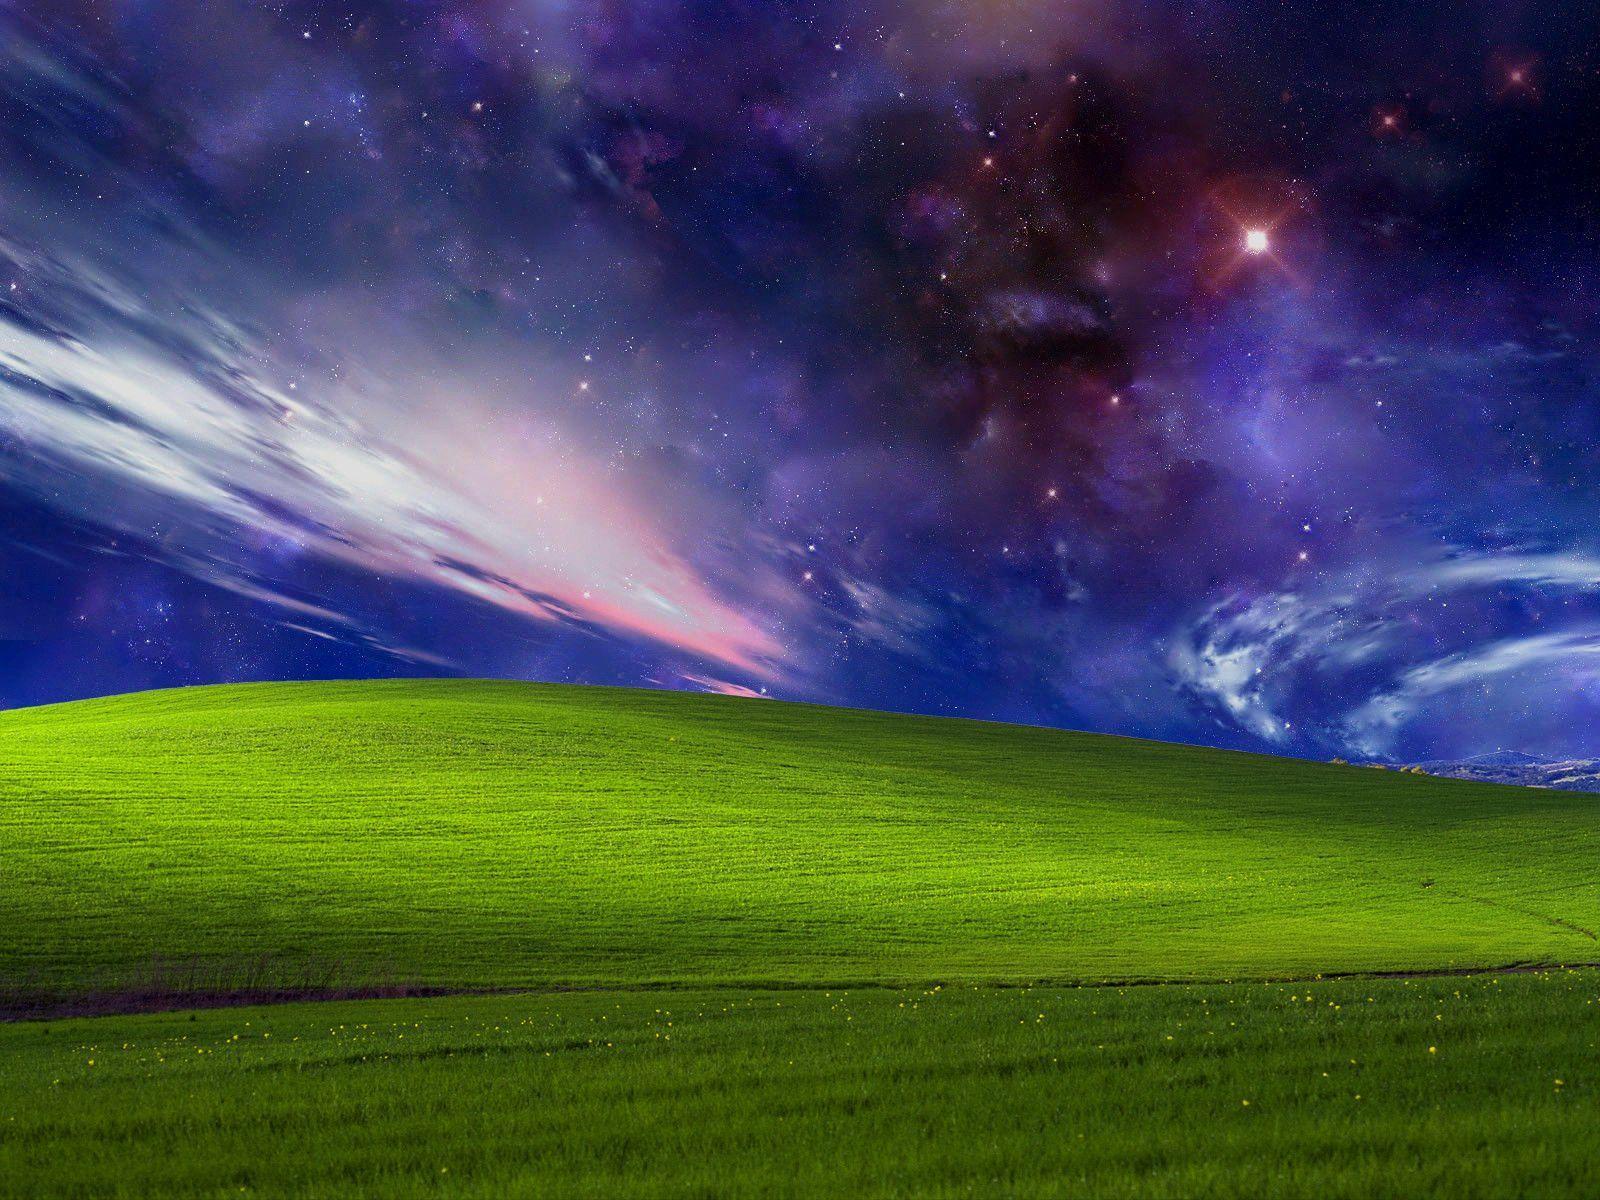 Windows Xp Wallpaper 1080p